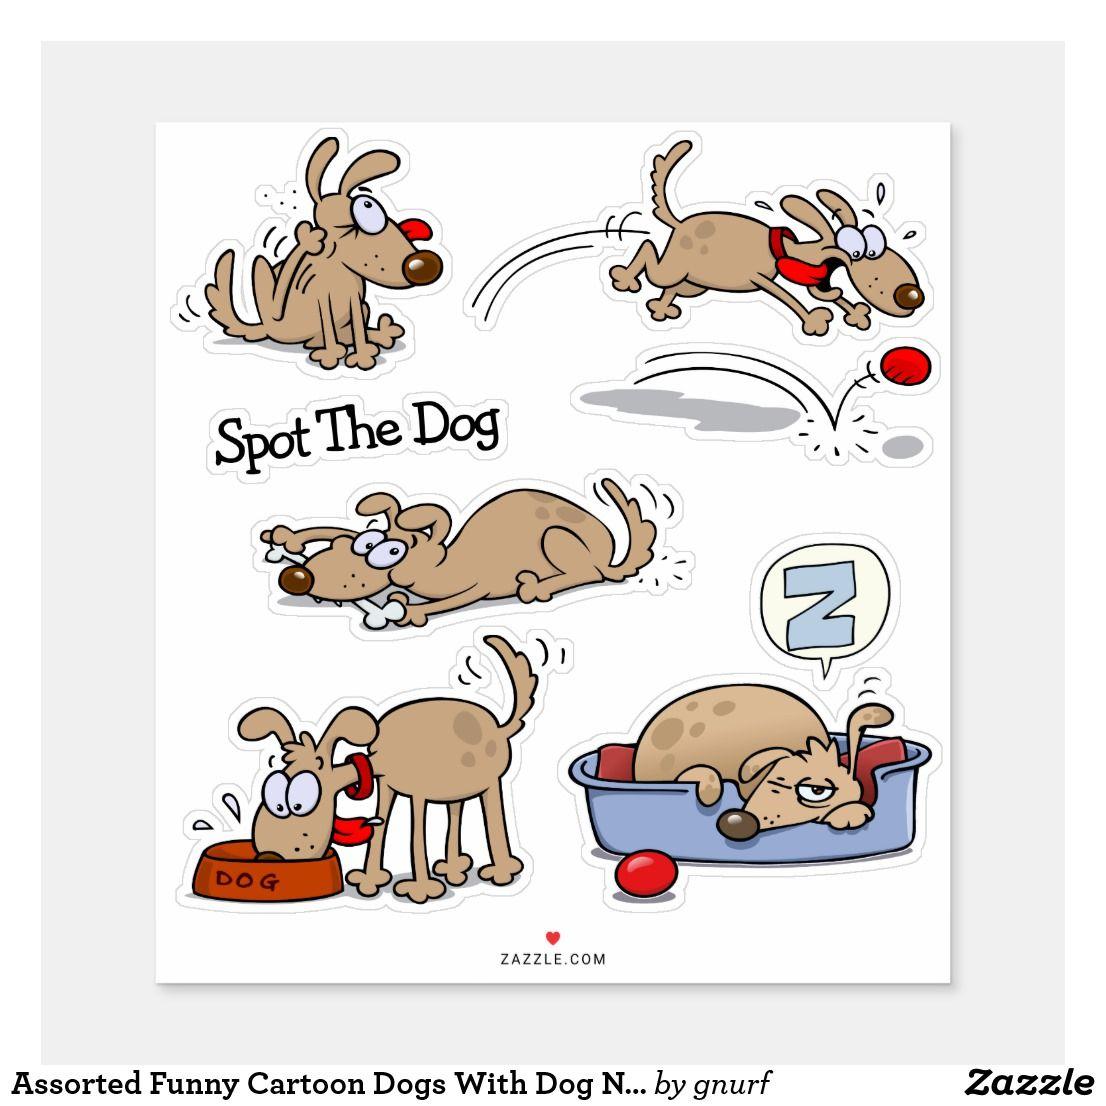 Assorted Funny Cartoon Dogs With Dog Name Sticker Zazzle Com